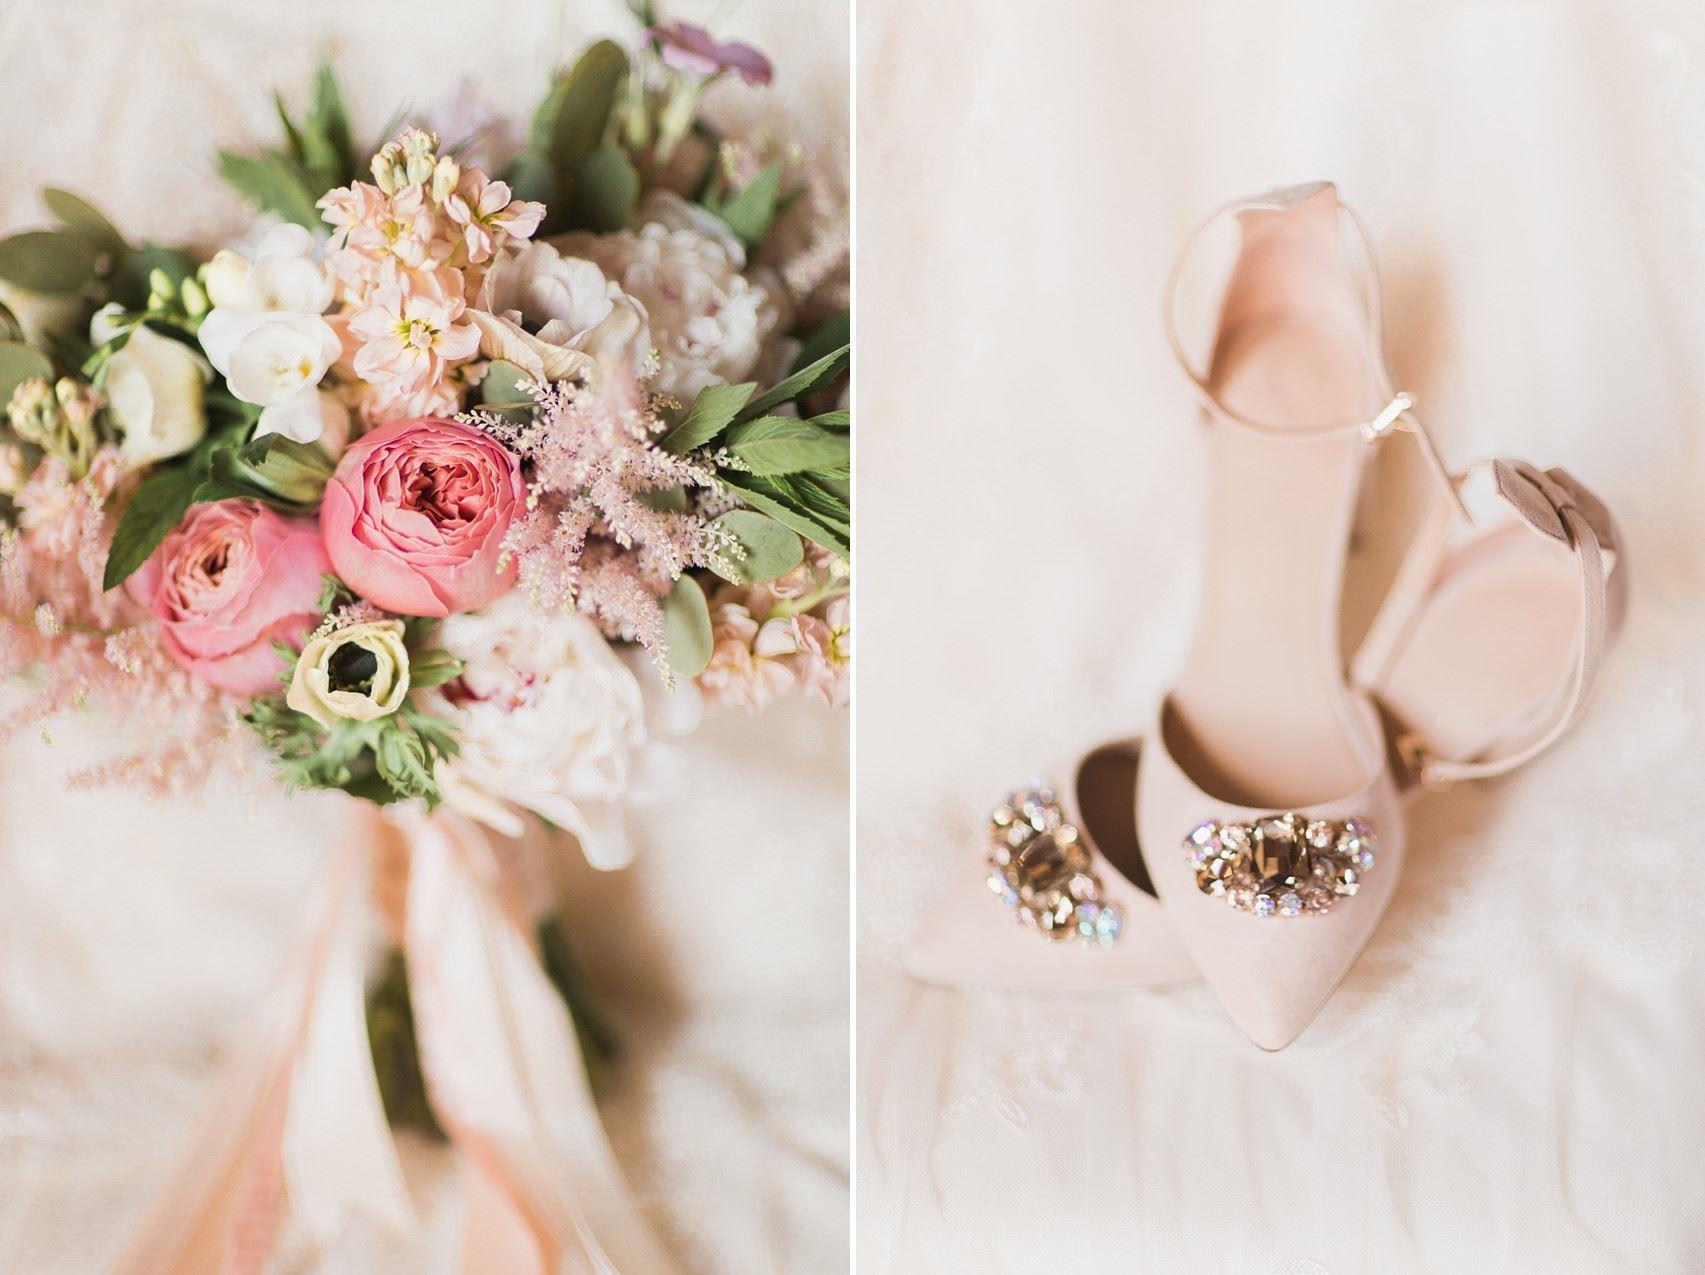 A Romantic Summer Wedding with an Elegant Barn Reception : Chic ...